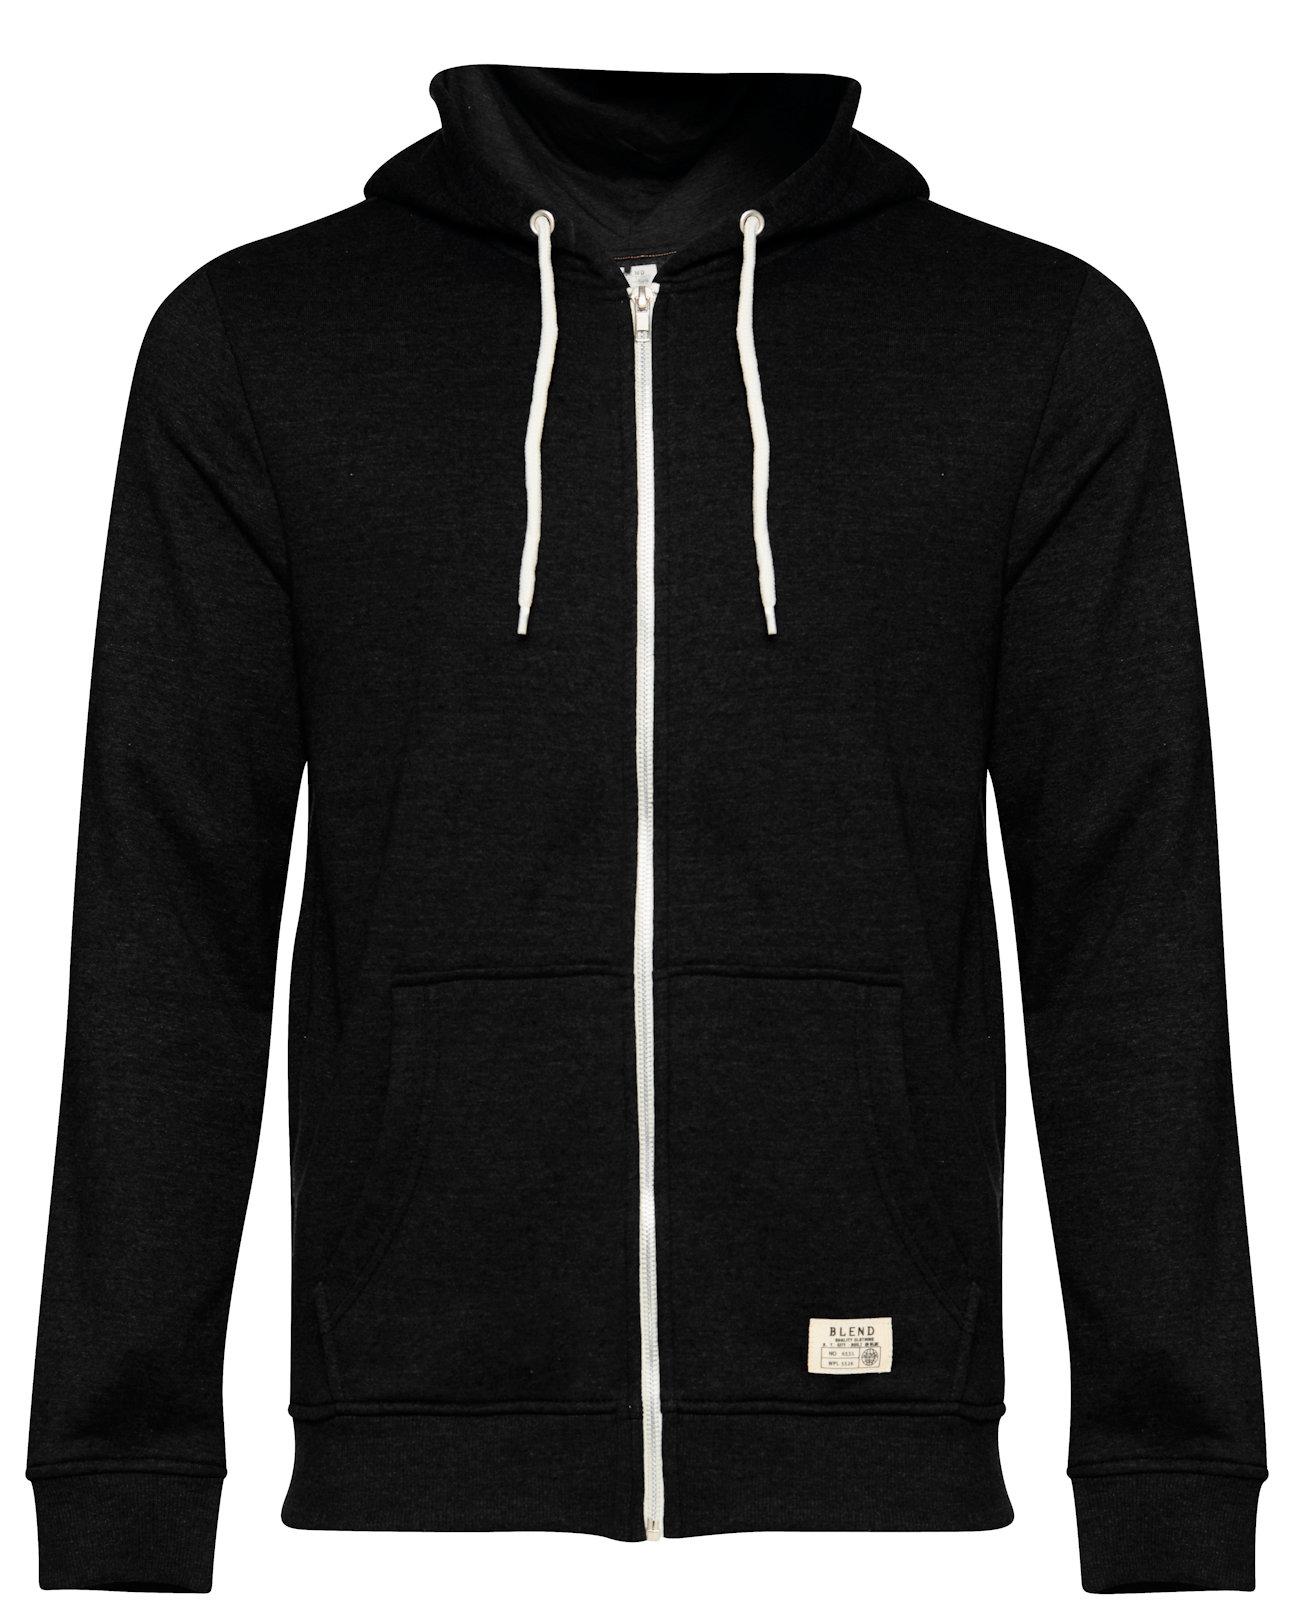 blend hoodie herren sweatshirt jacke zipper kapuzen pullover sale neu 701628 ebay. Black Bedroom Furniture Sets. Home Design Ideas